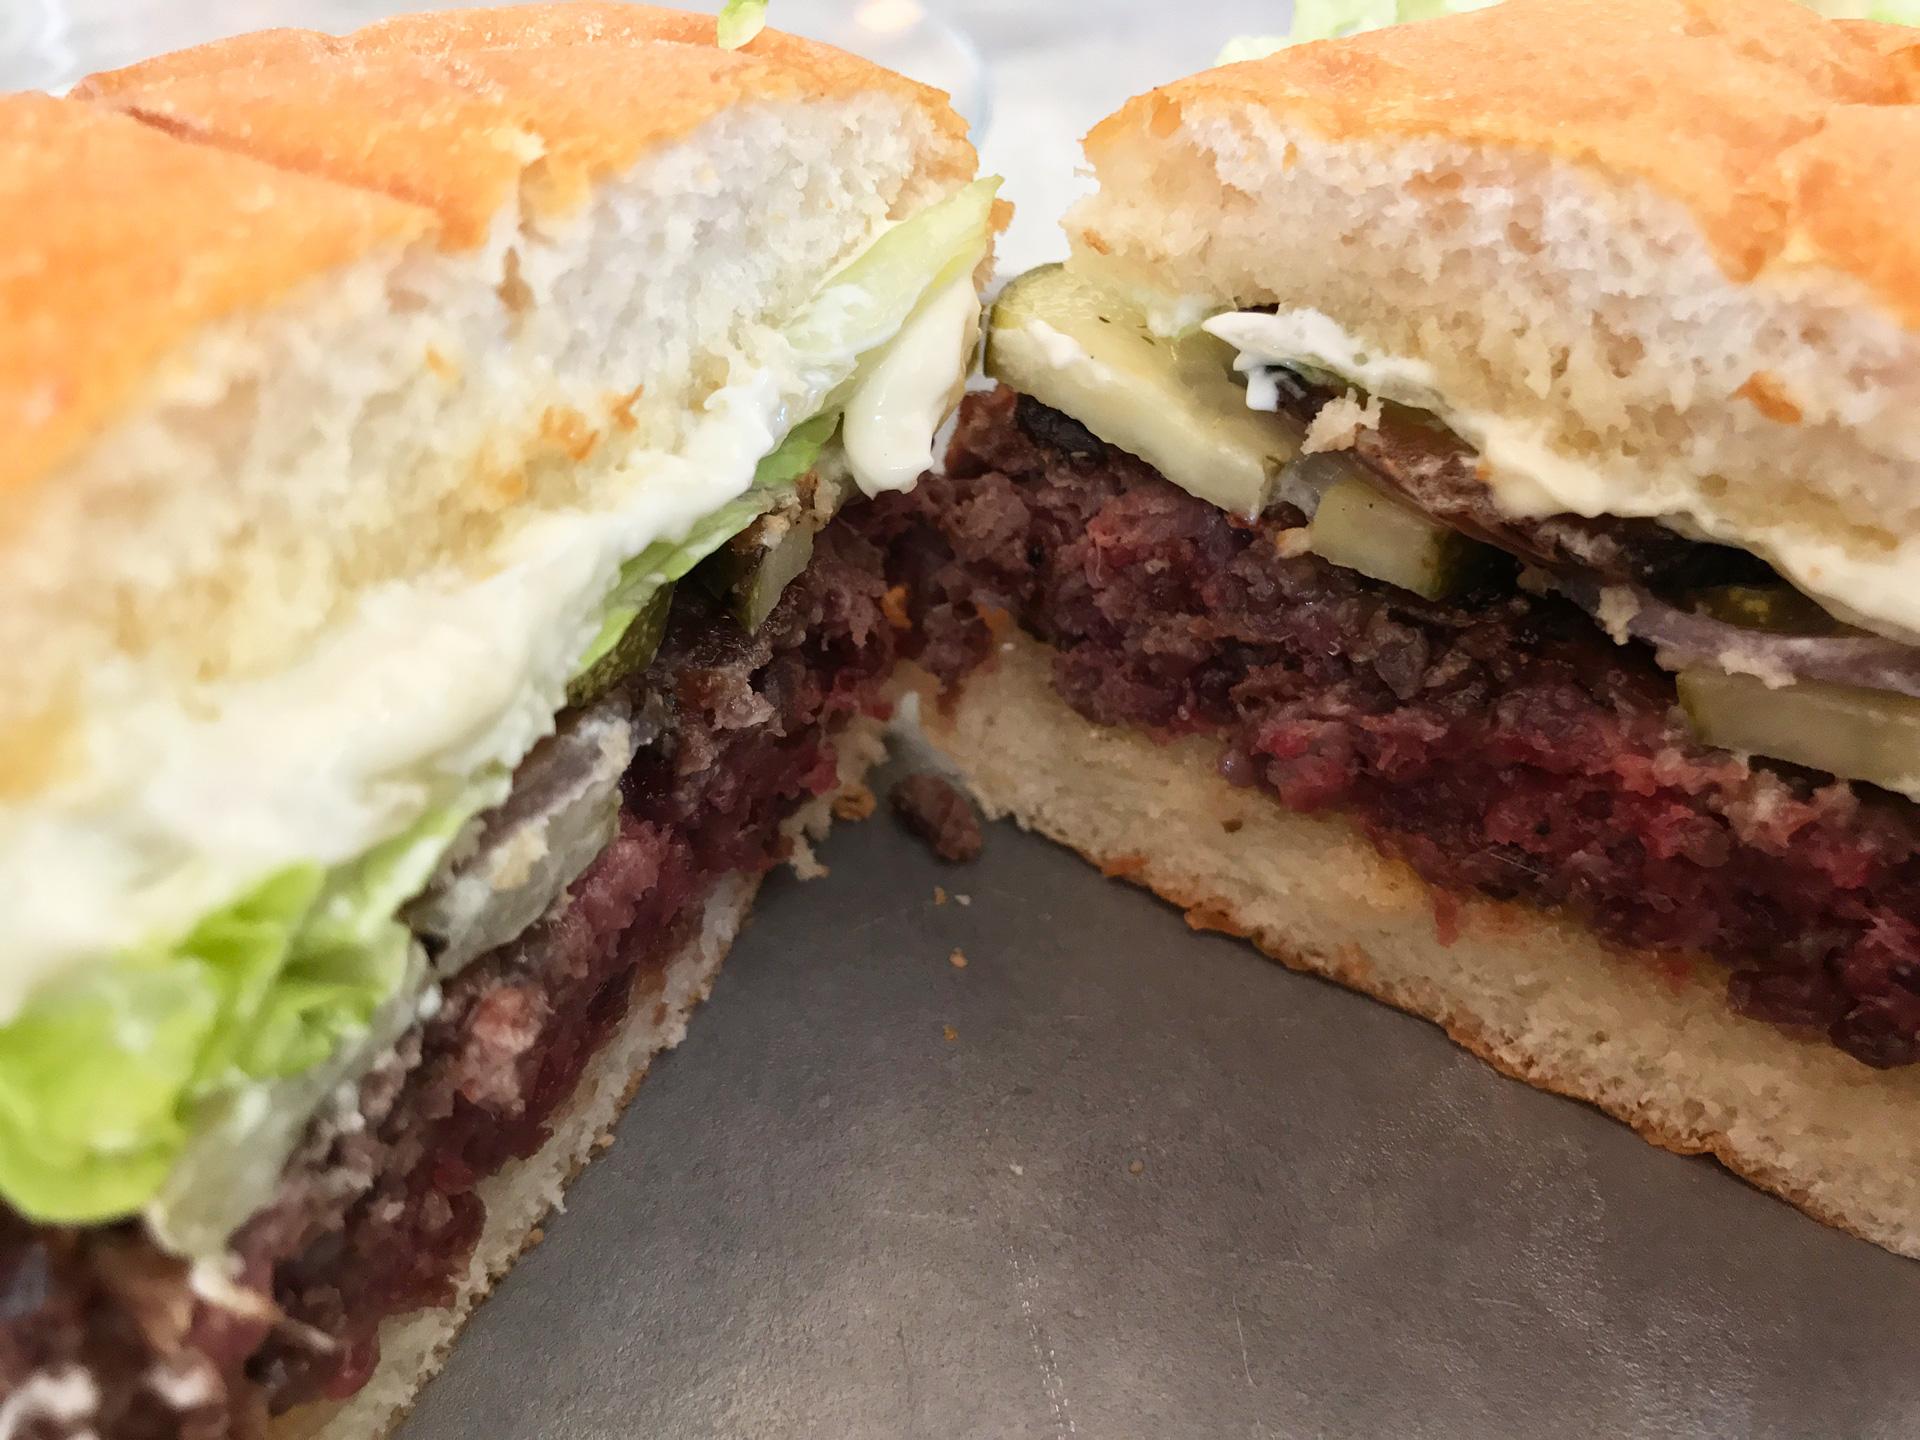 The vegan Impossible Burger, whose main ingredient is heme.